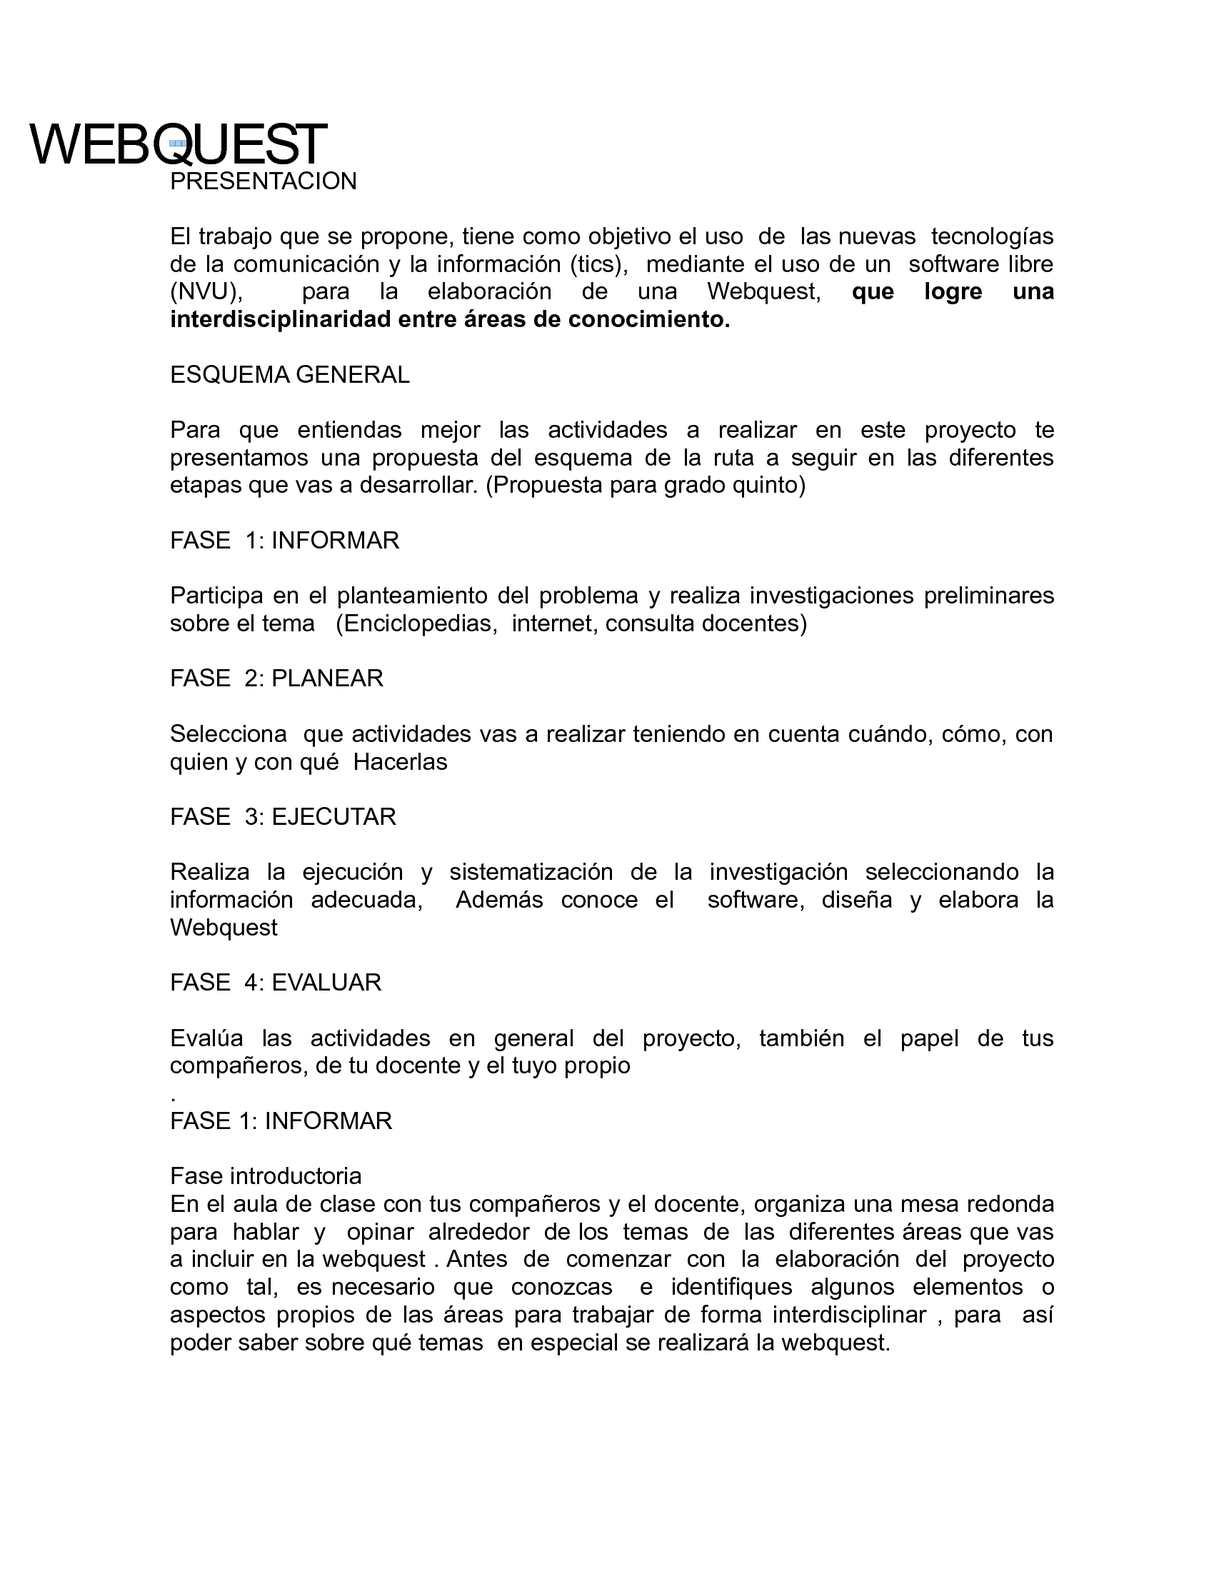 Moderno Nvu Plantillas Ideas Ornamento Elaboración Festooning Adorno ...